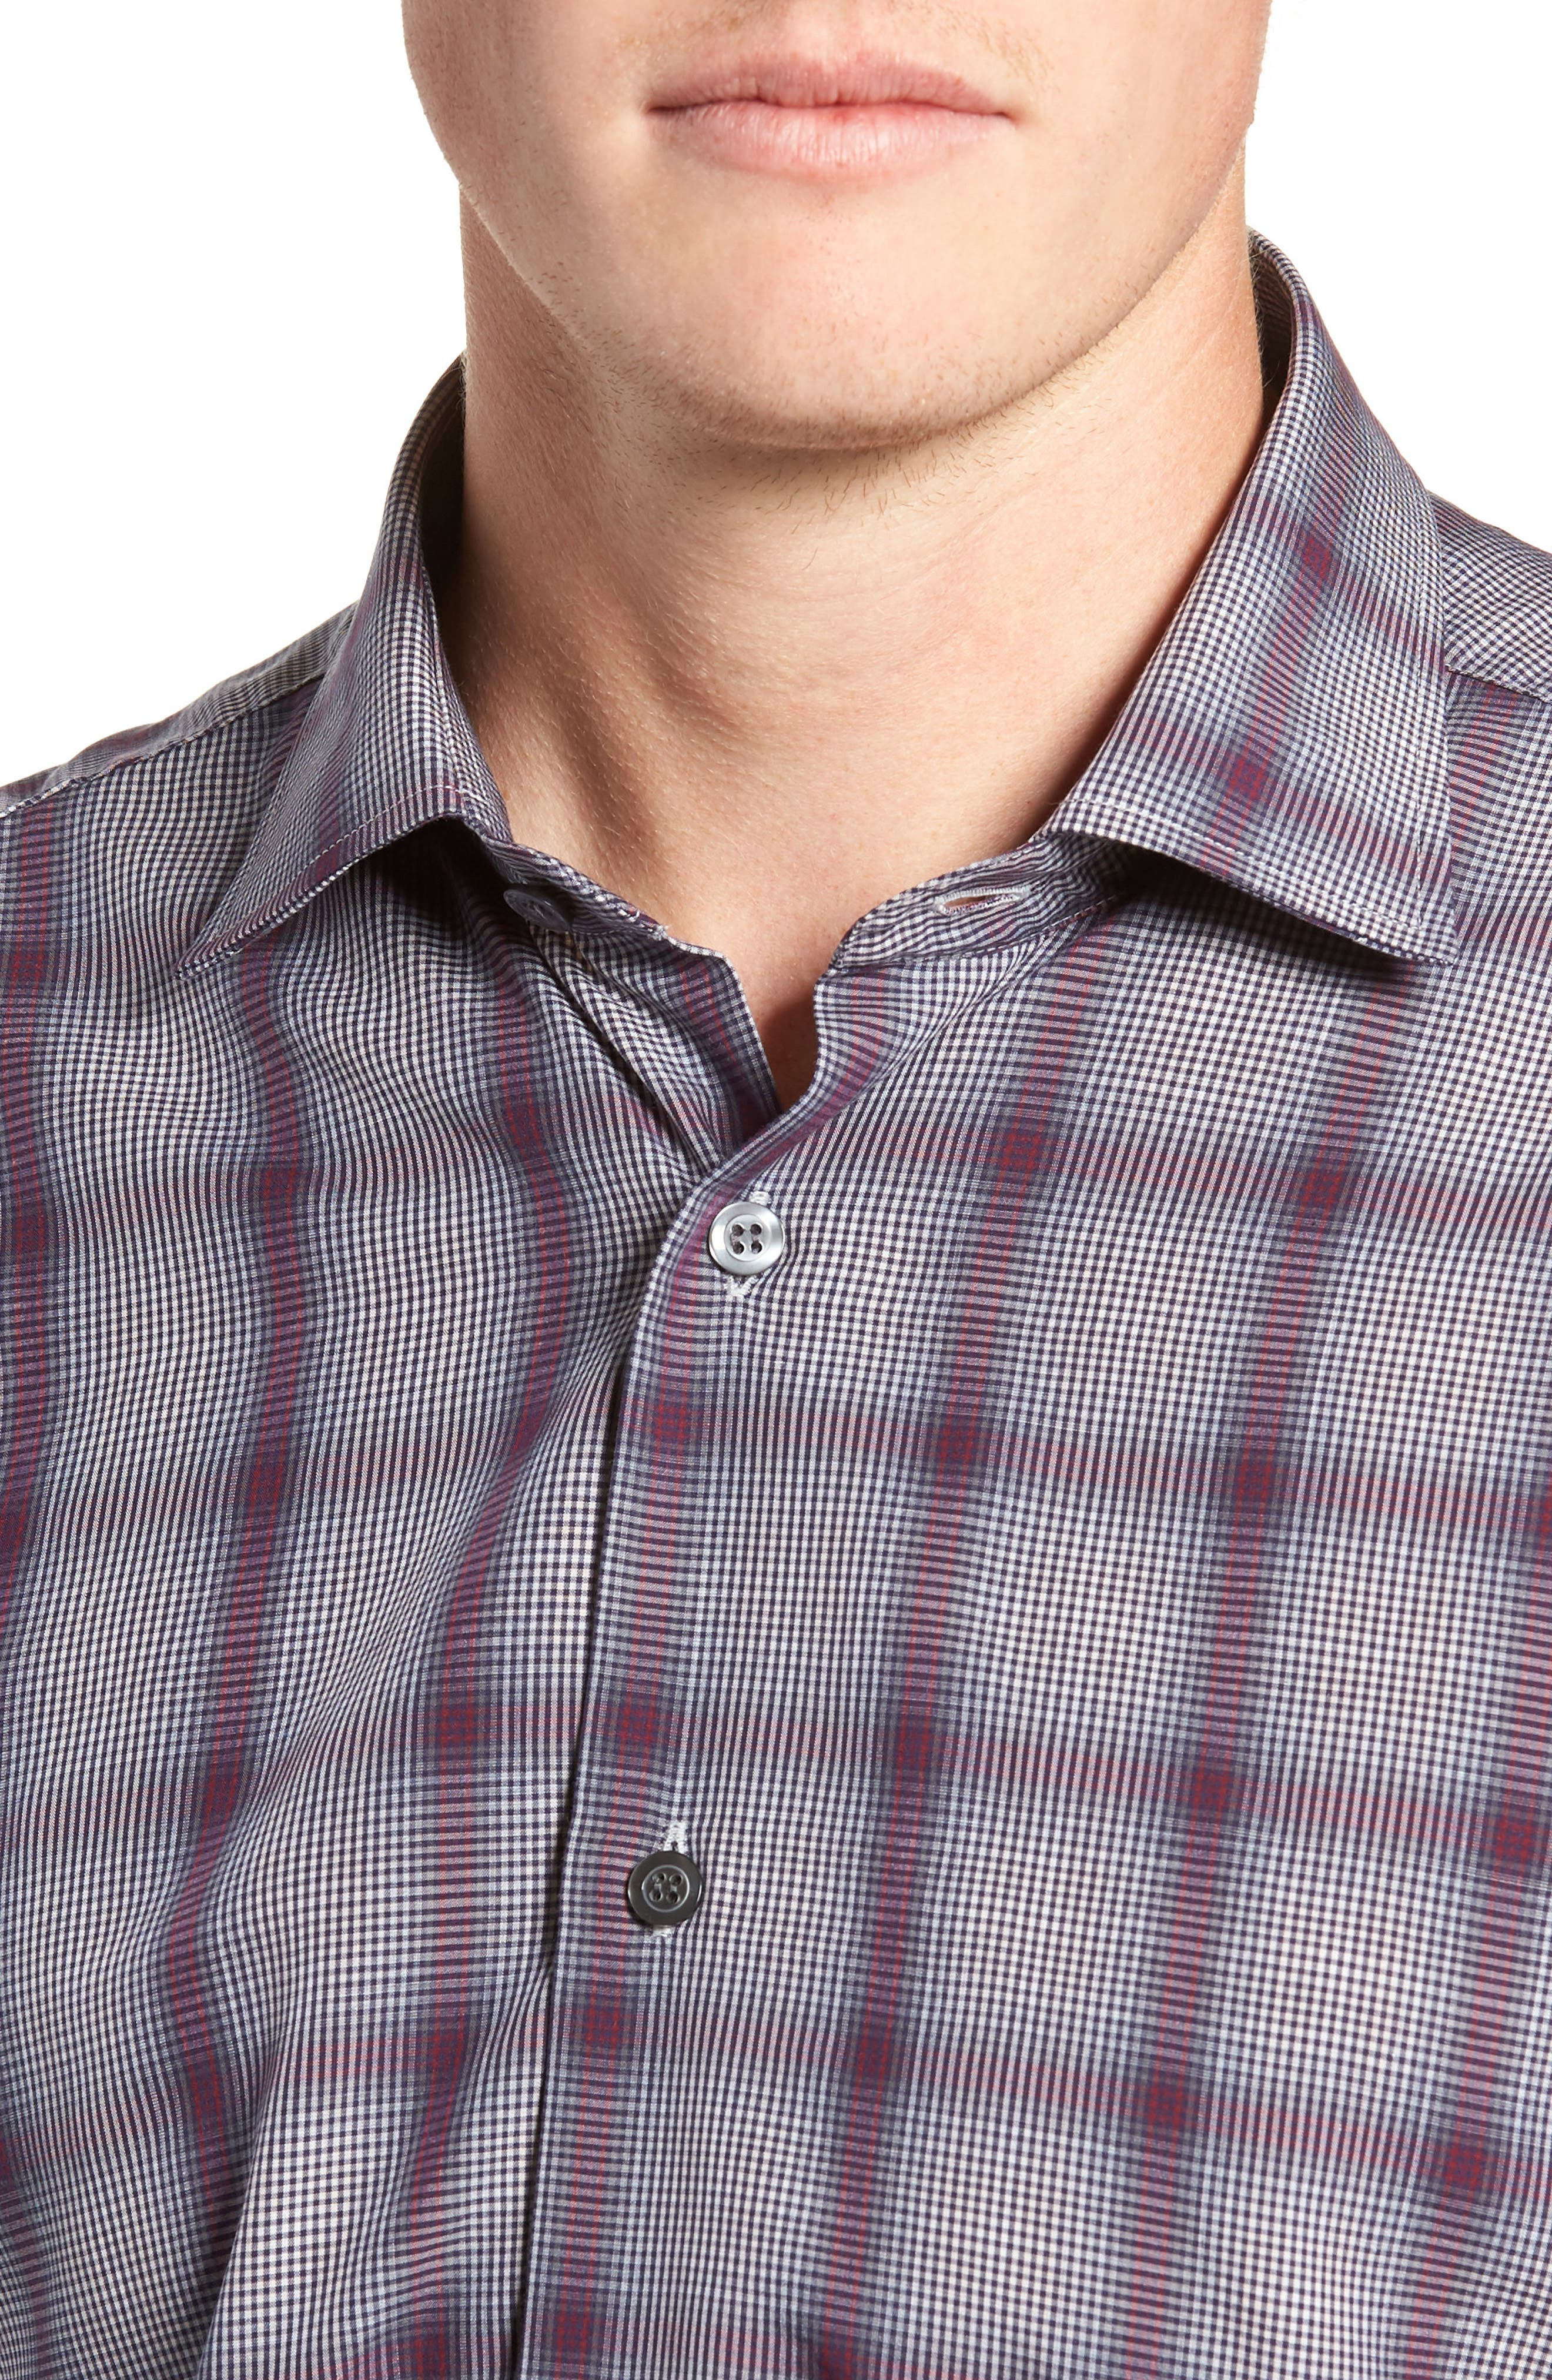 Tailored Fit Plaid Sport Shirt,                             Alternate thumbnail 2, color,                             600